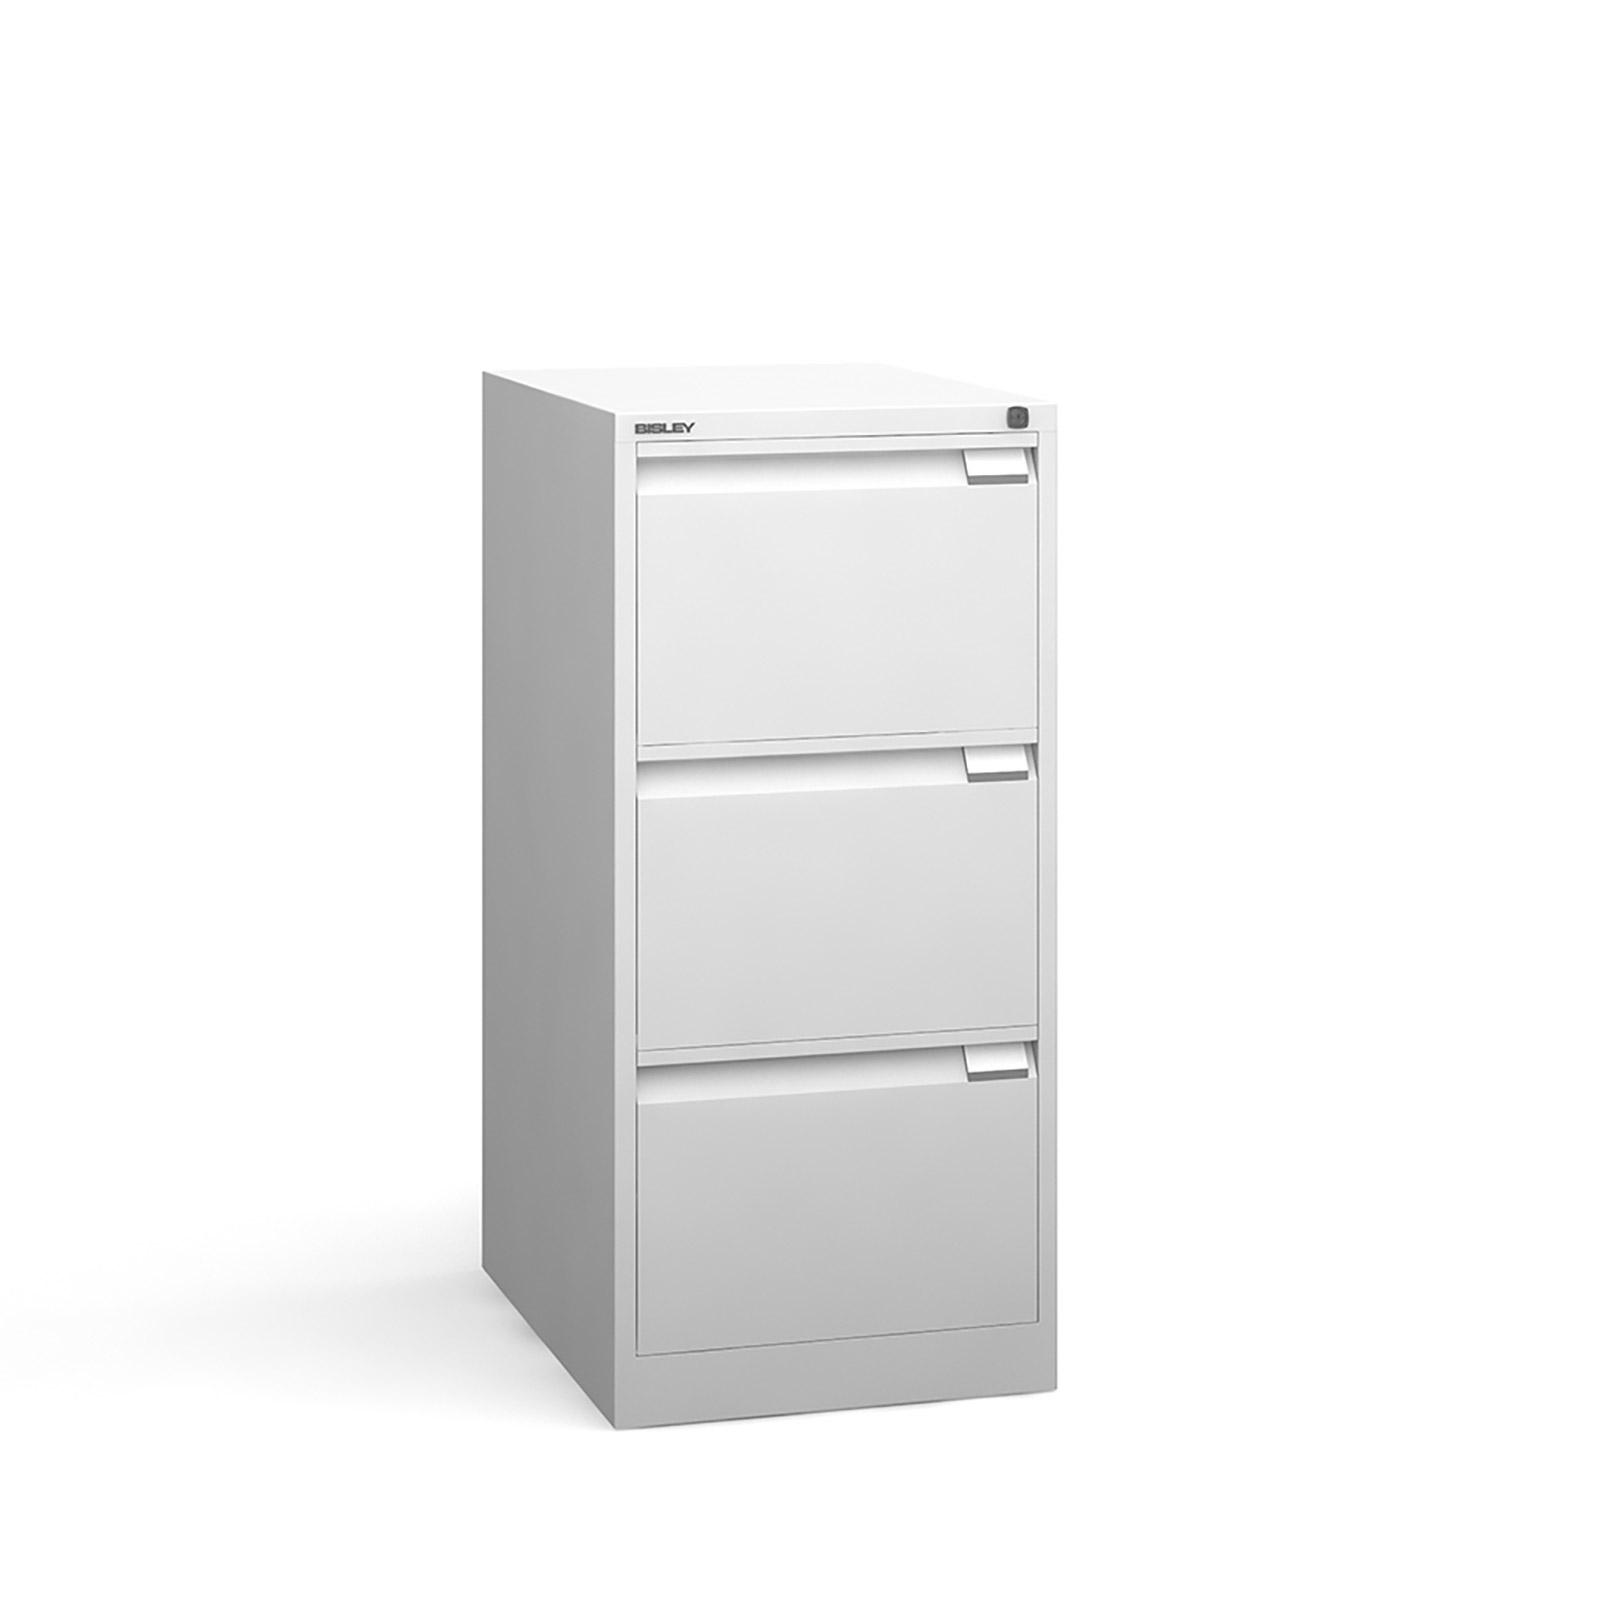 Bisley 3 drawer BS filing cabinet 1016mm - white